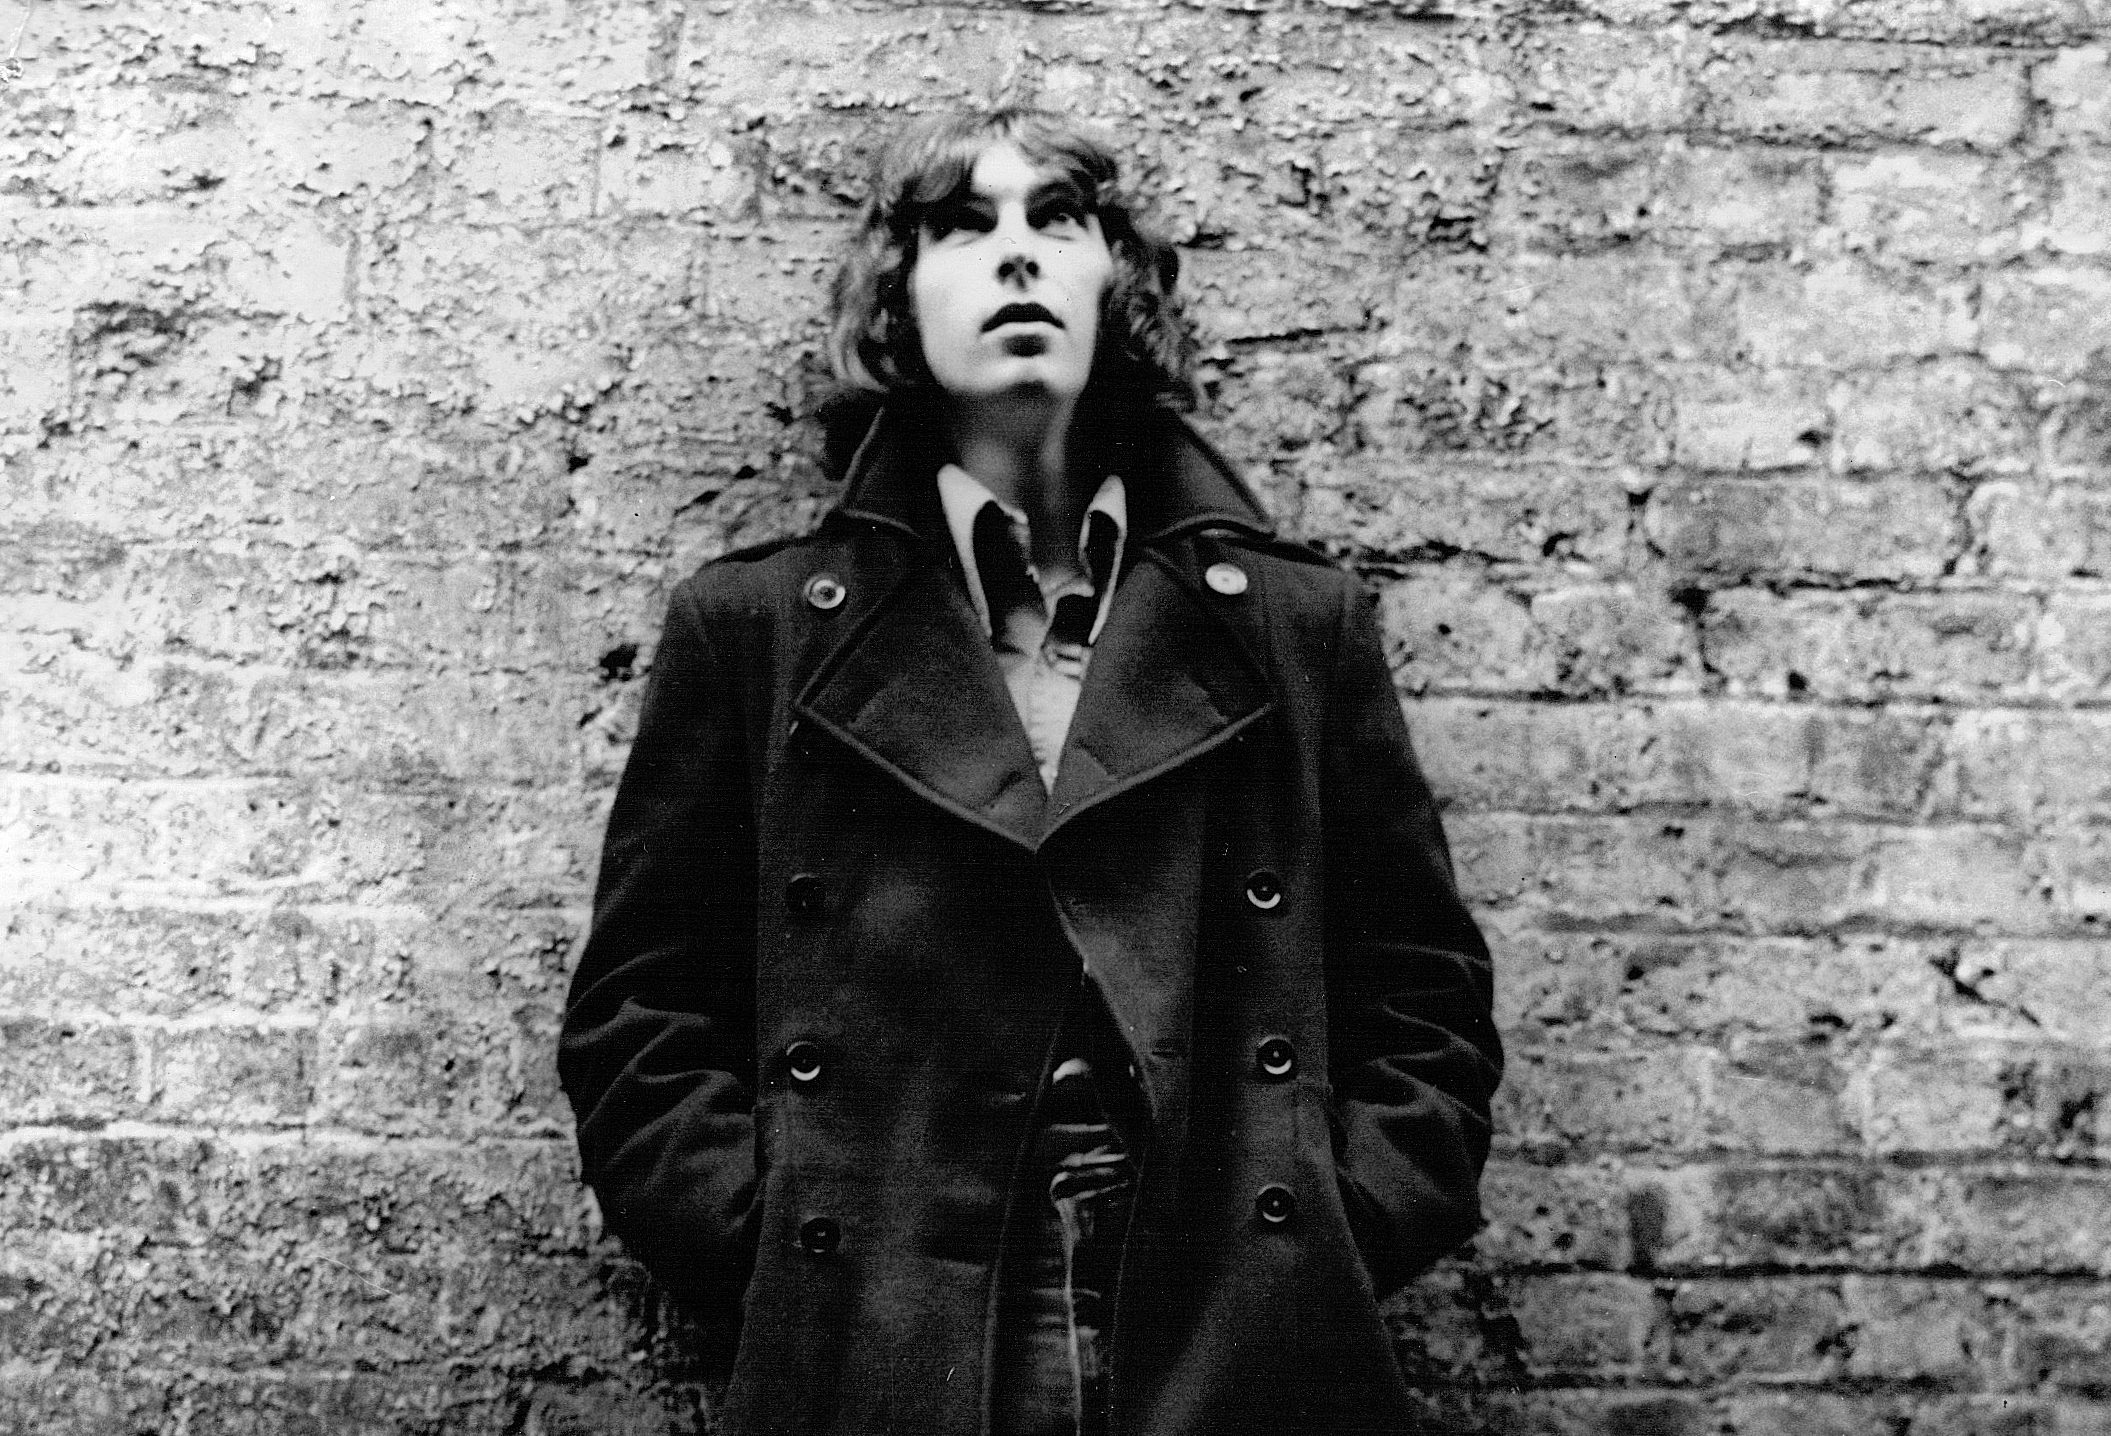 Jim Kelly in 1969.